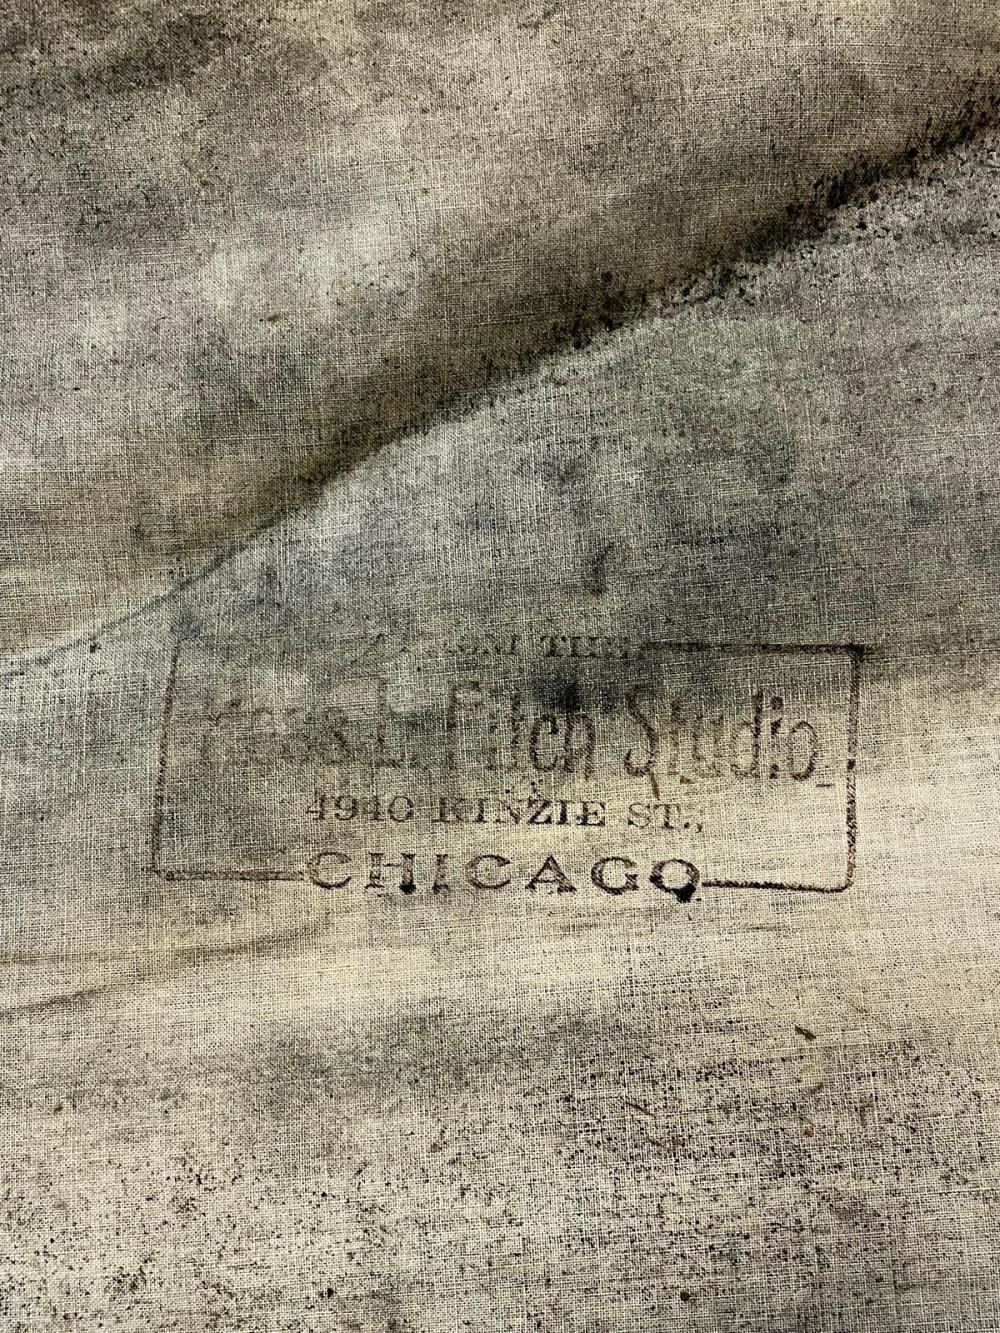 Antique c. 1890 J.E. Hale's Photograph Studio Hand Painted Scene Canvas Backdrop From Ross L. Fitch Studio, Chicago